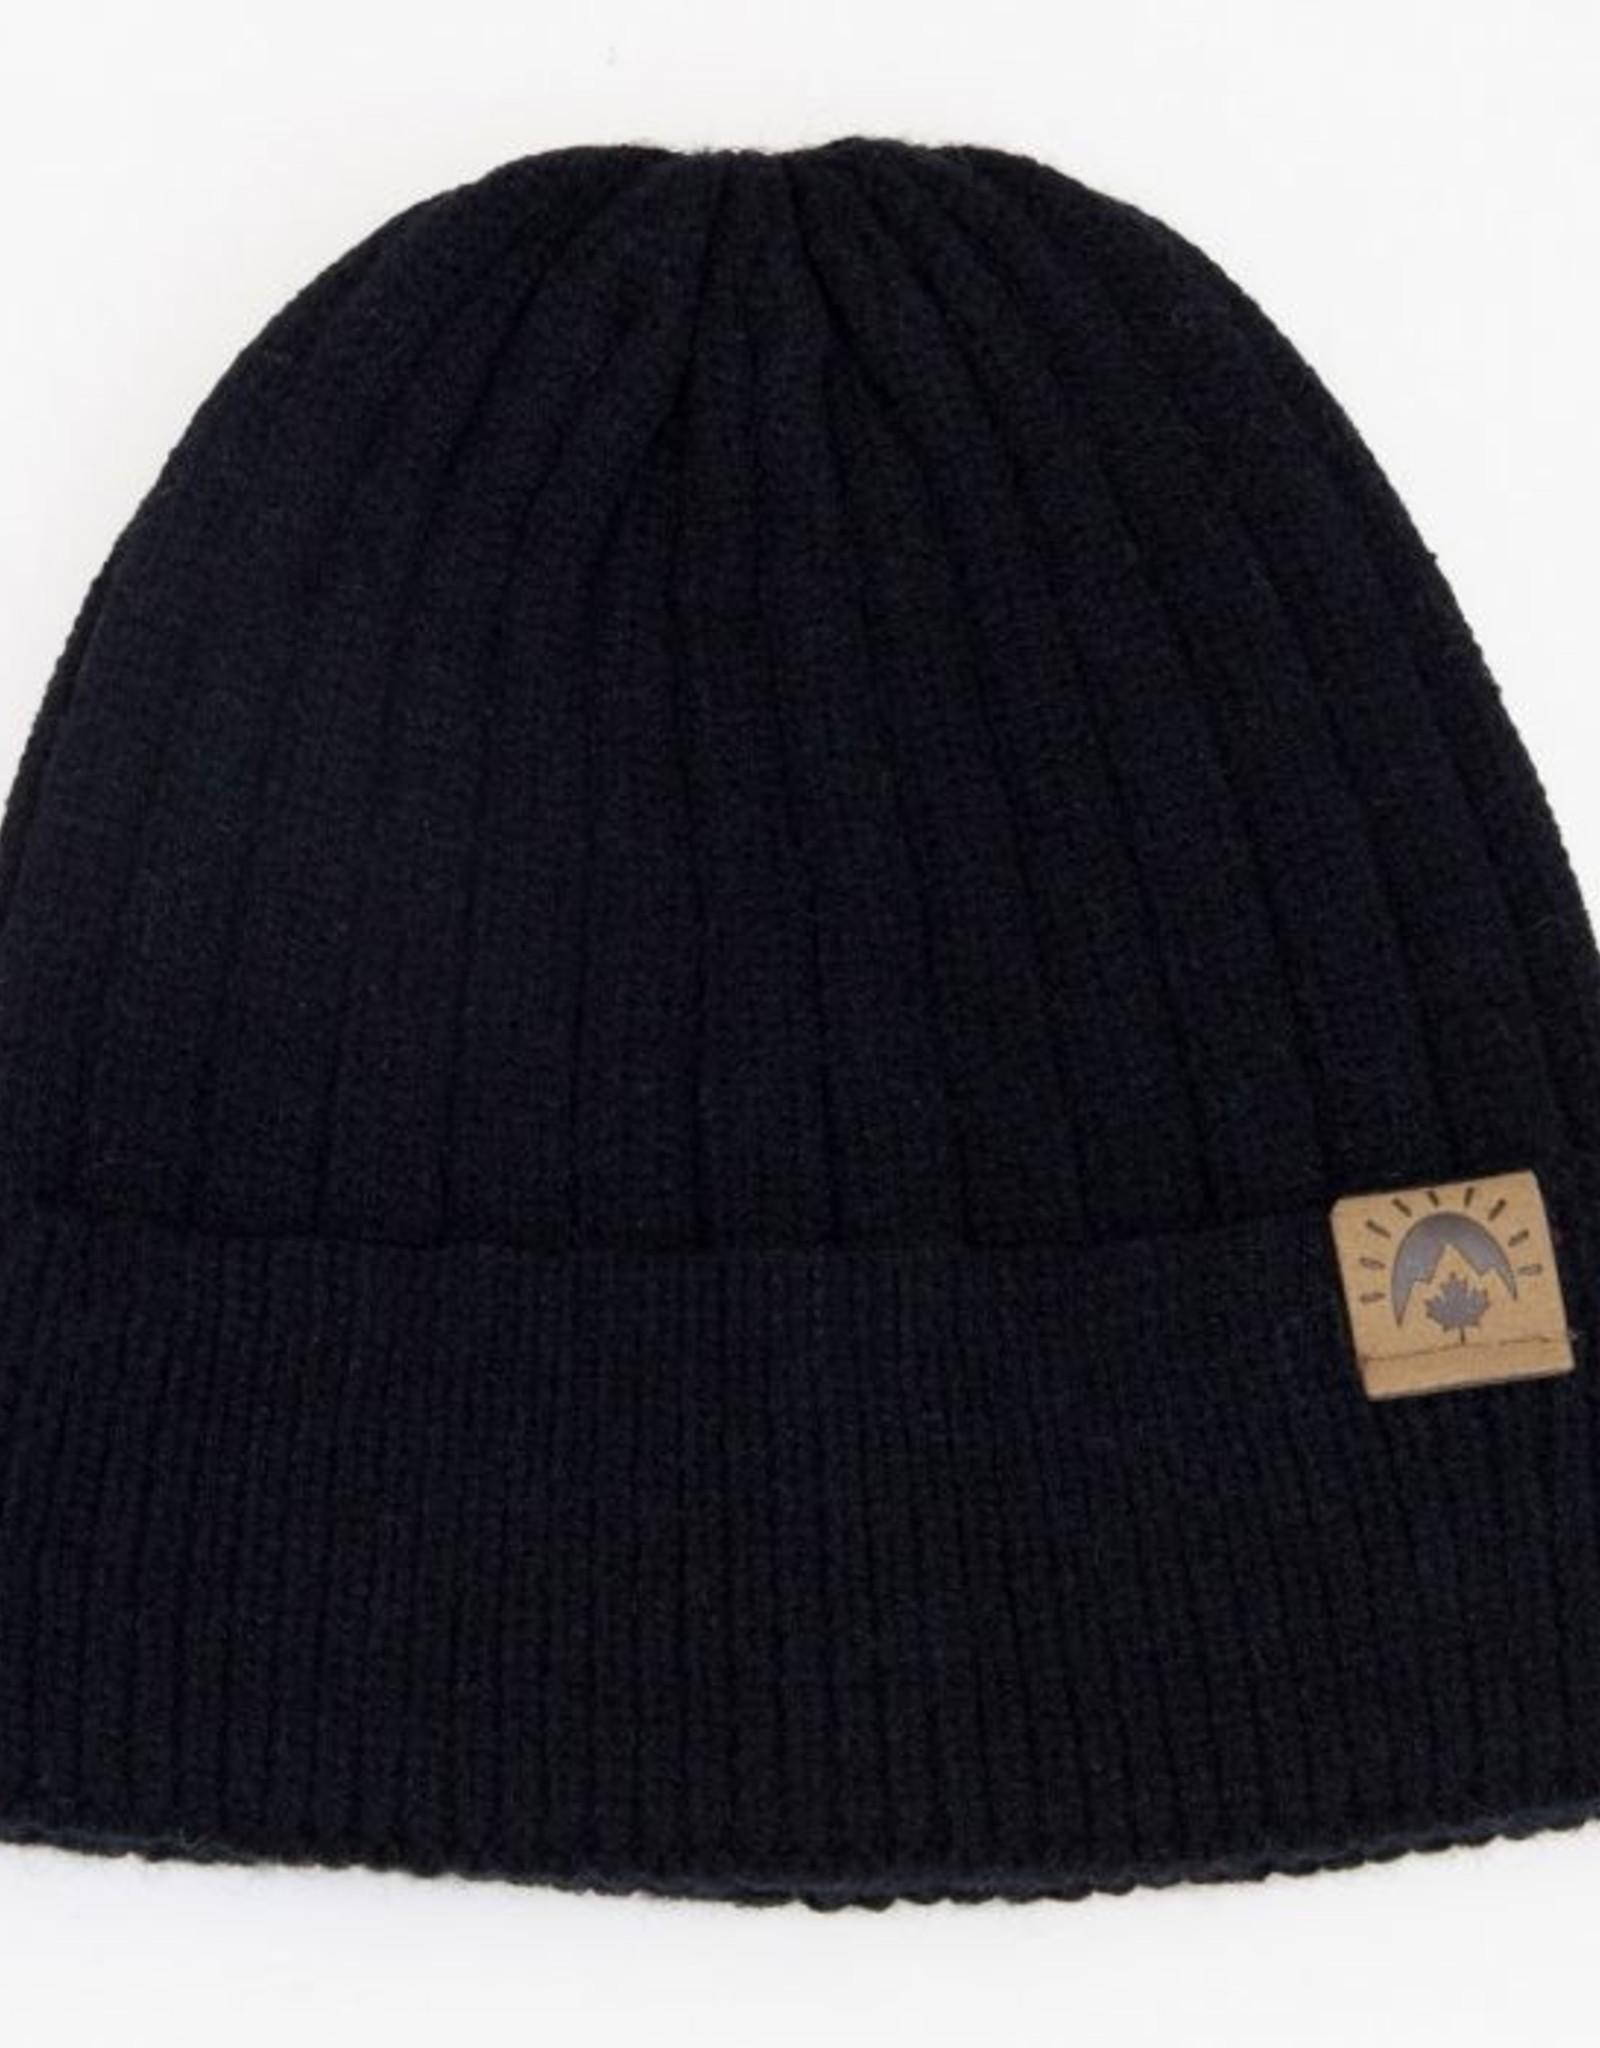 CaliKids FA20 Black Soft Knit Hat